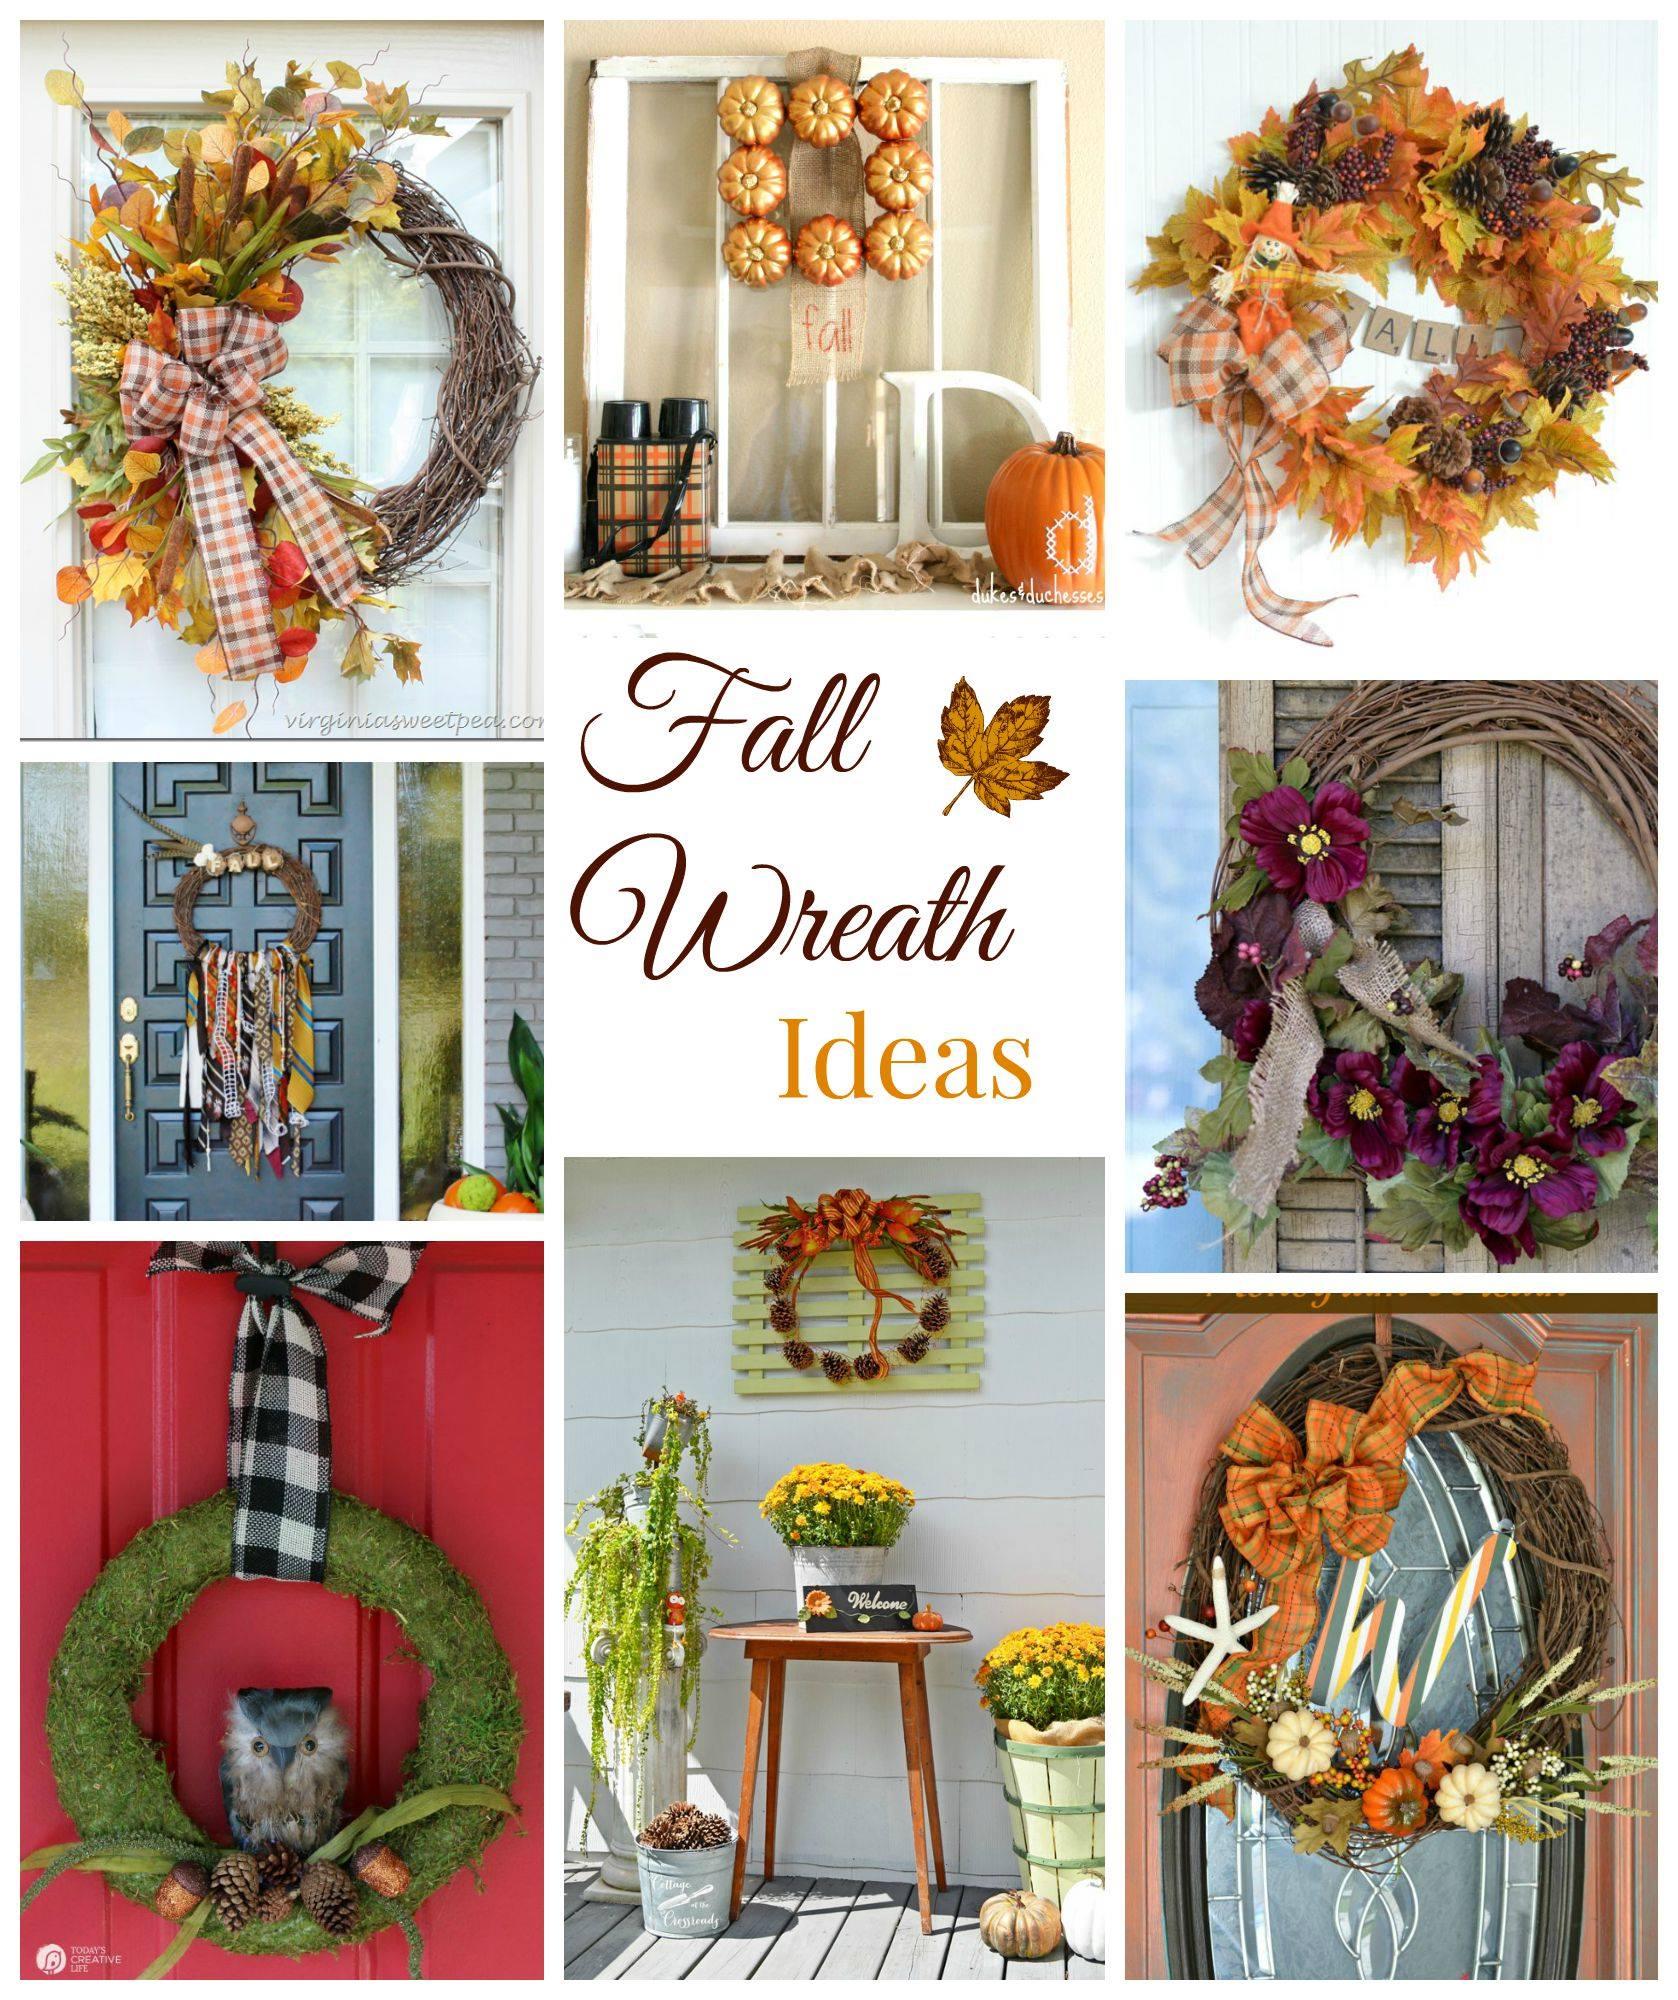 Fall Group Wreath